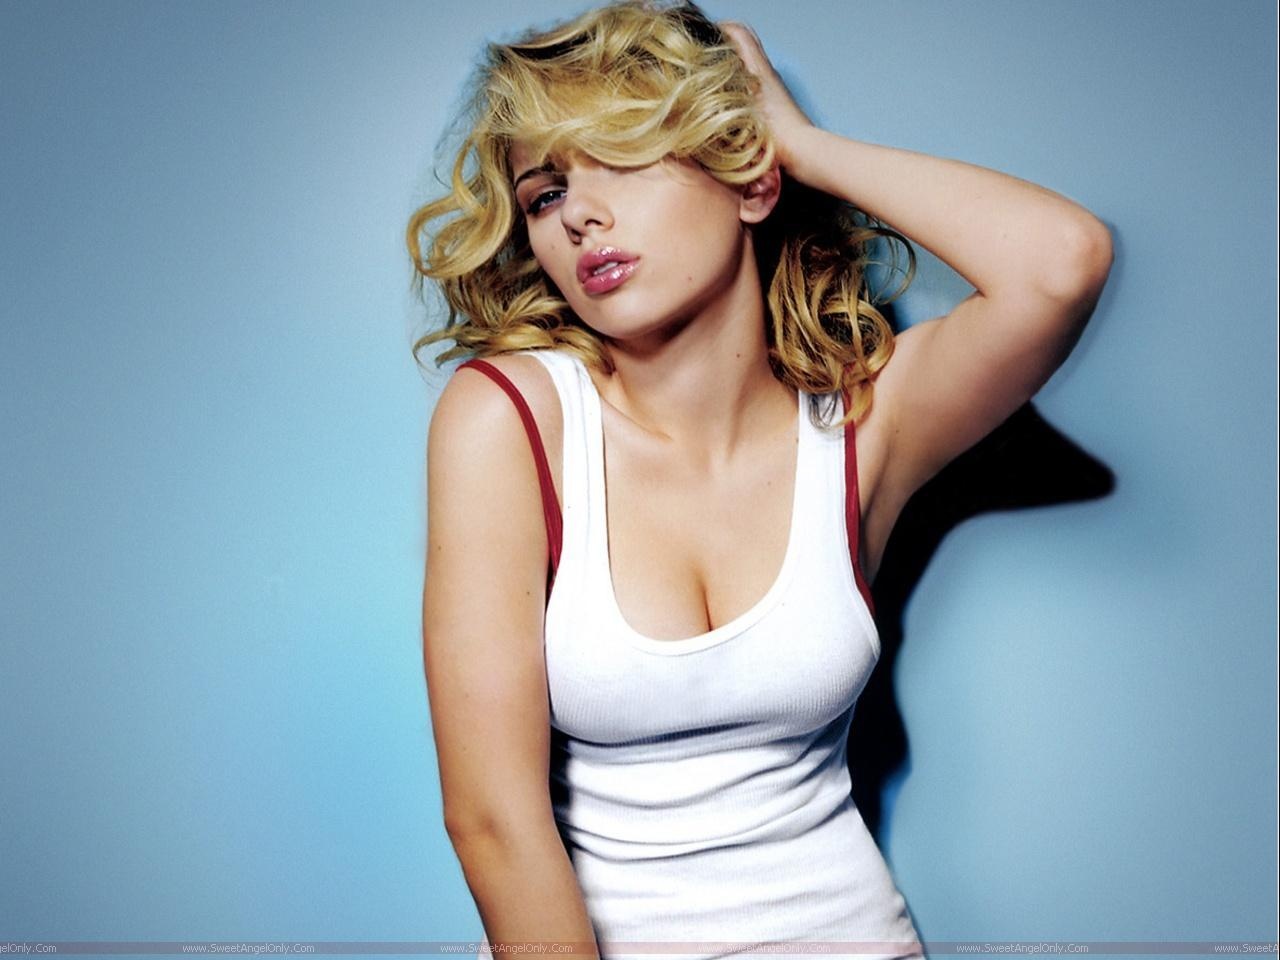 http://2.bp.blogspot.com/-HJ9kTZEylGA/ThRNG8WgaoI/AAAAAAAAHcY/d0jHh-NM6dY/s1600/Scarlett_Johansson_hot_lips.jpg